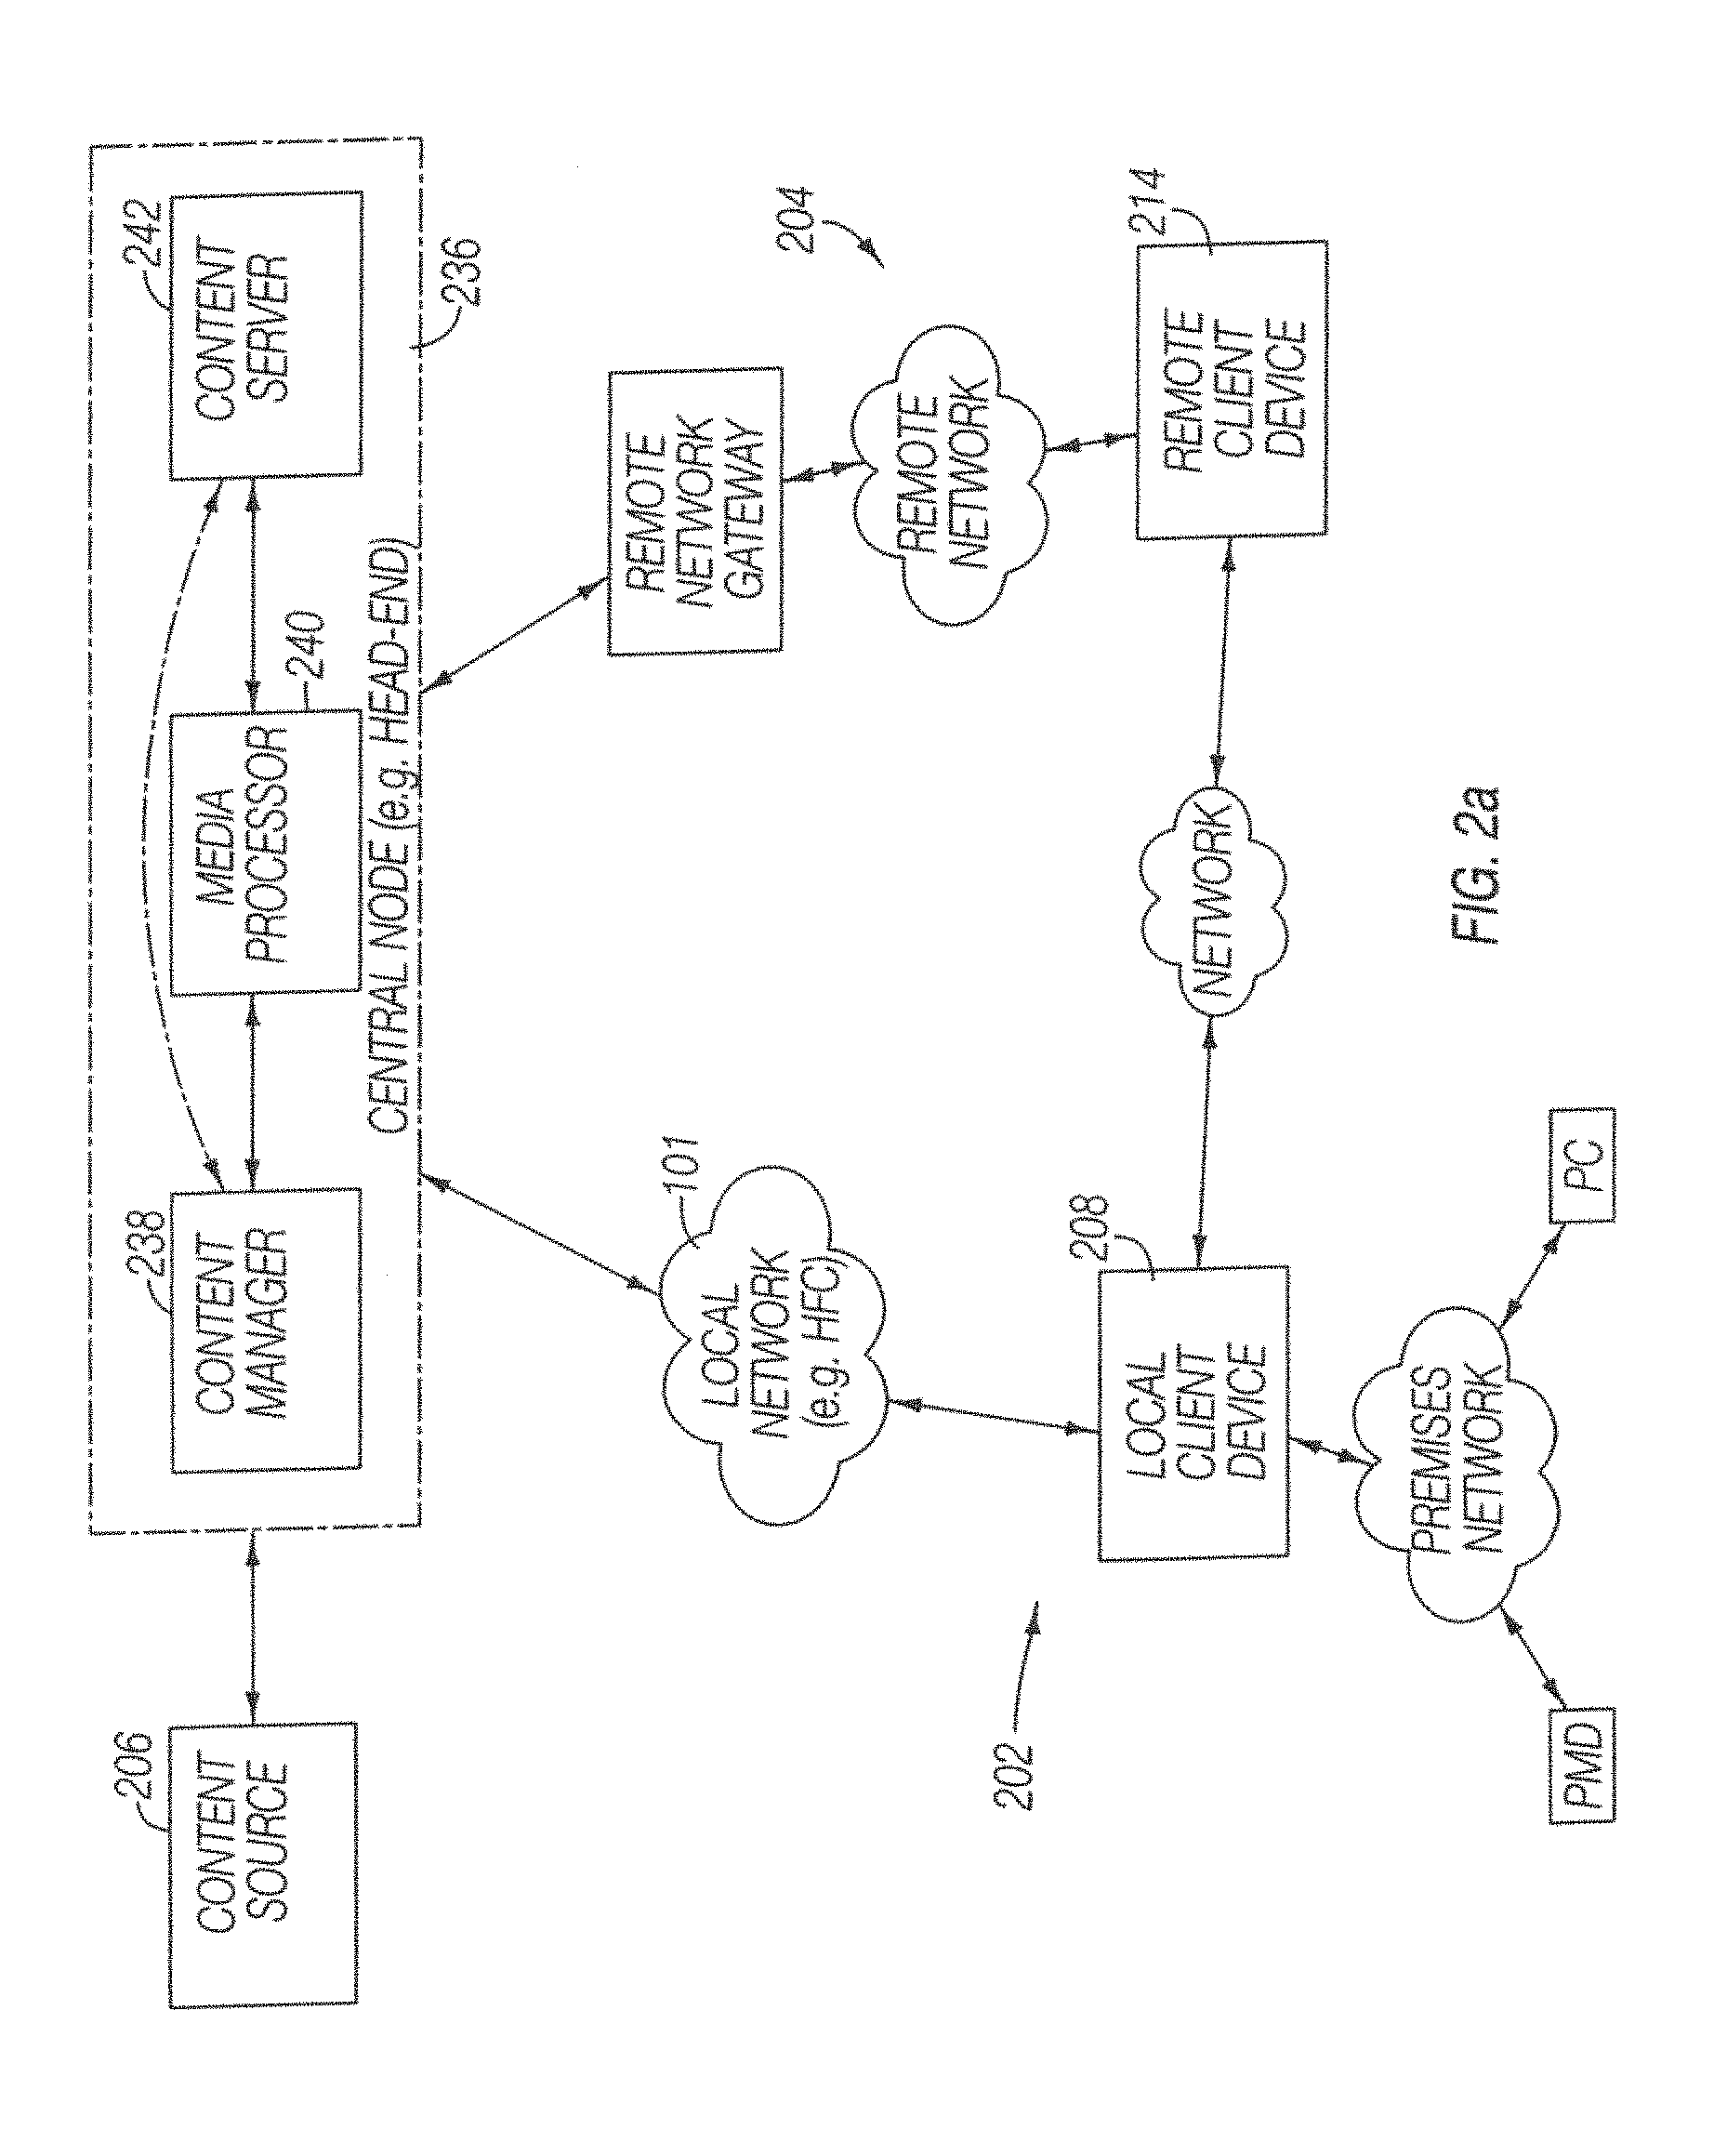 Patent US 9,832,246 B2